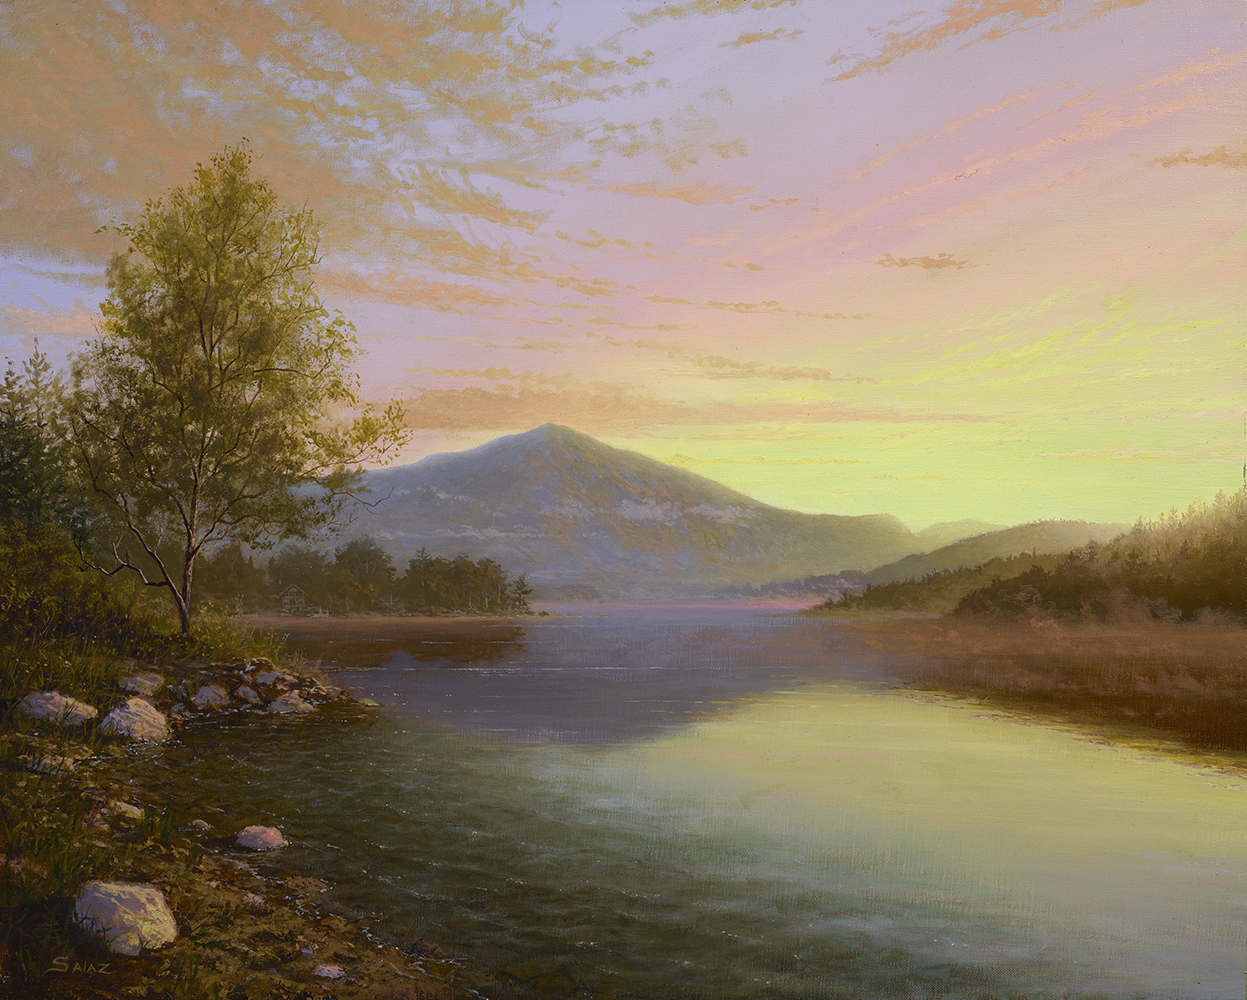 ken_salaz_kws1103_sunrise_over_lake_placid.jpg